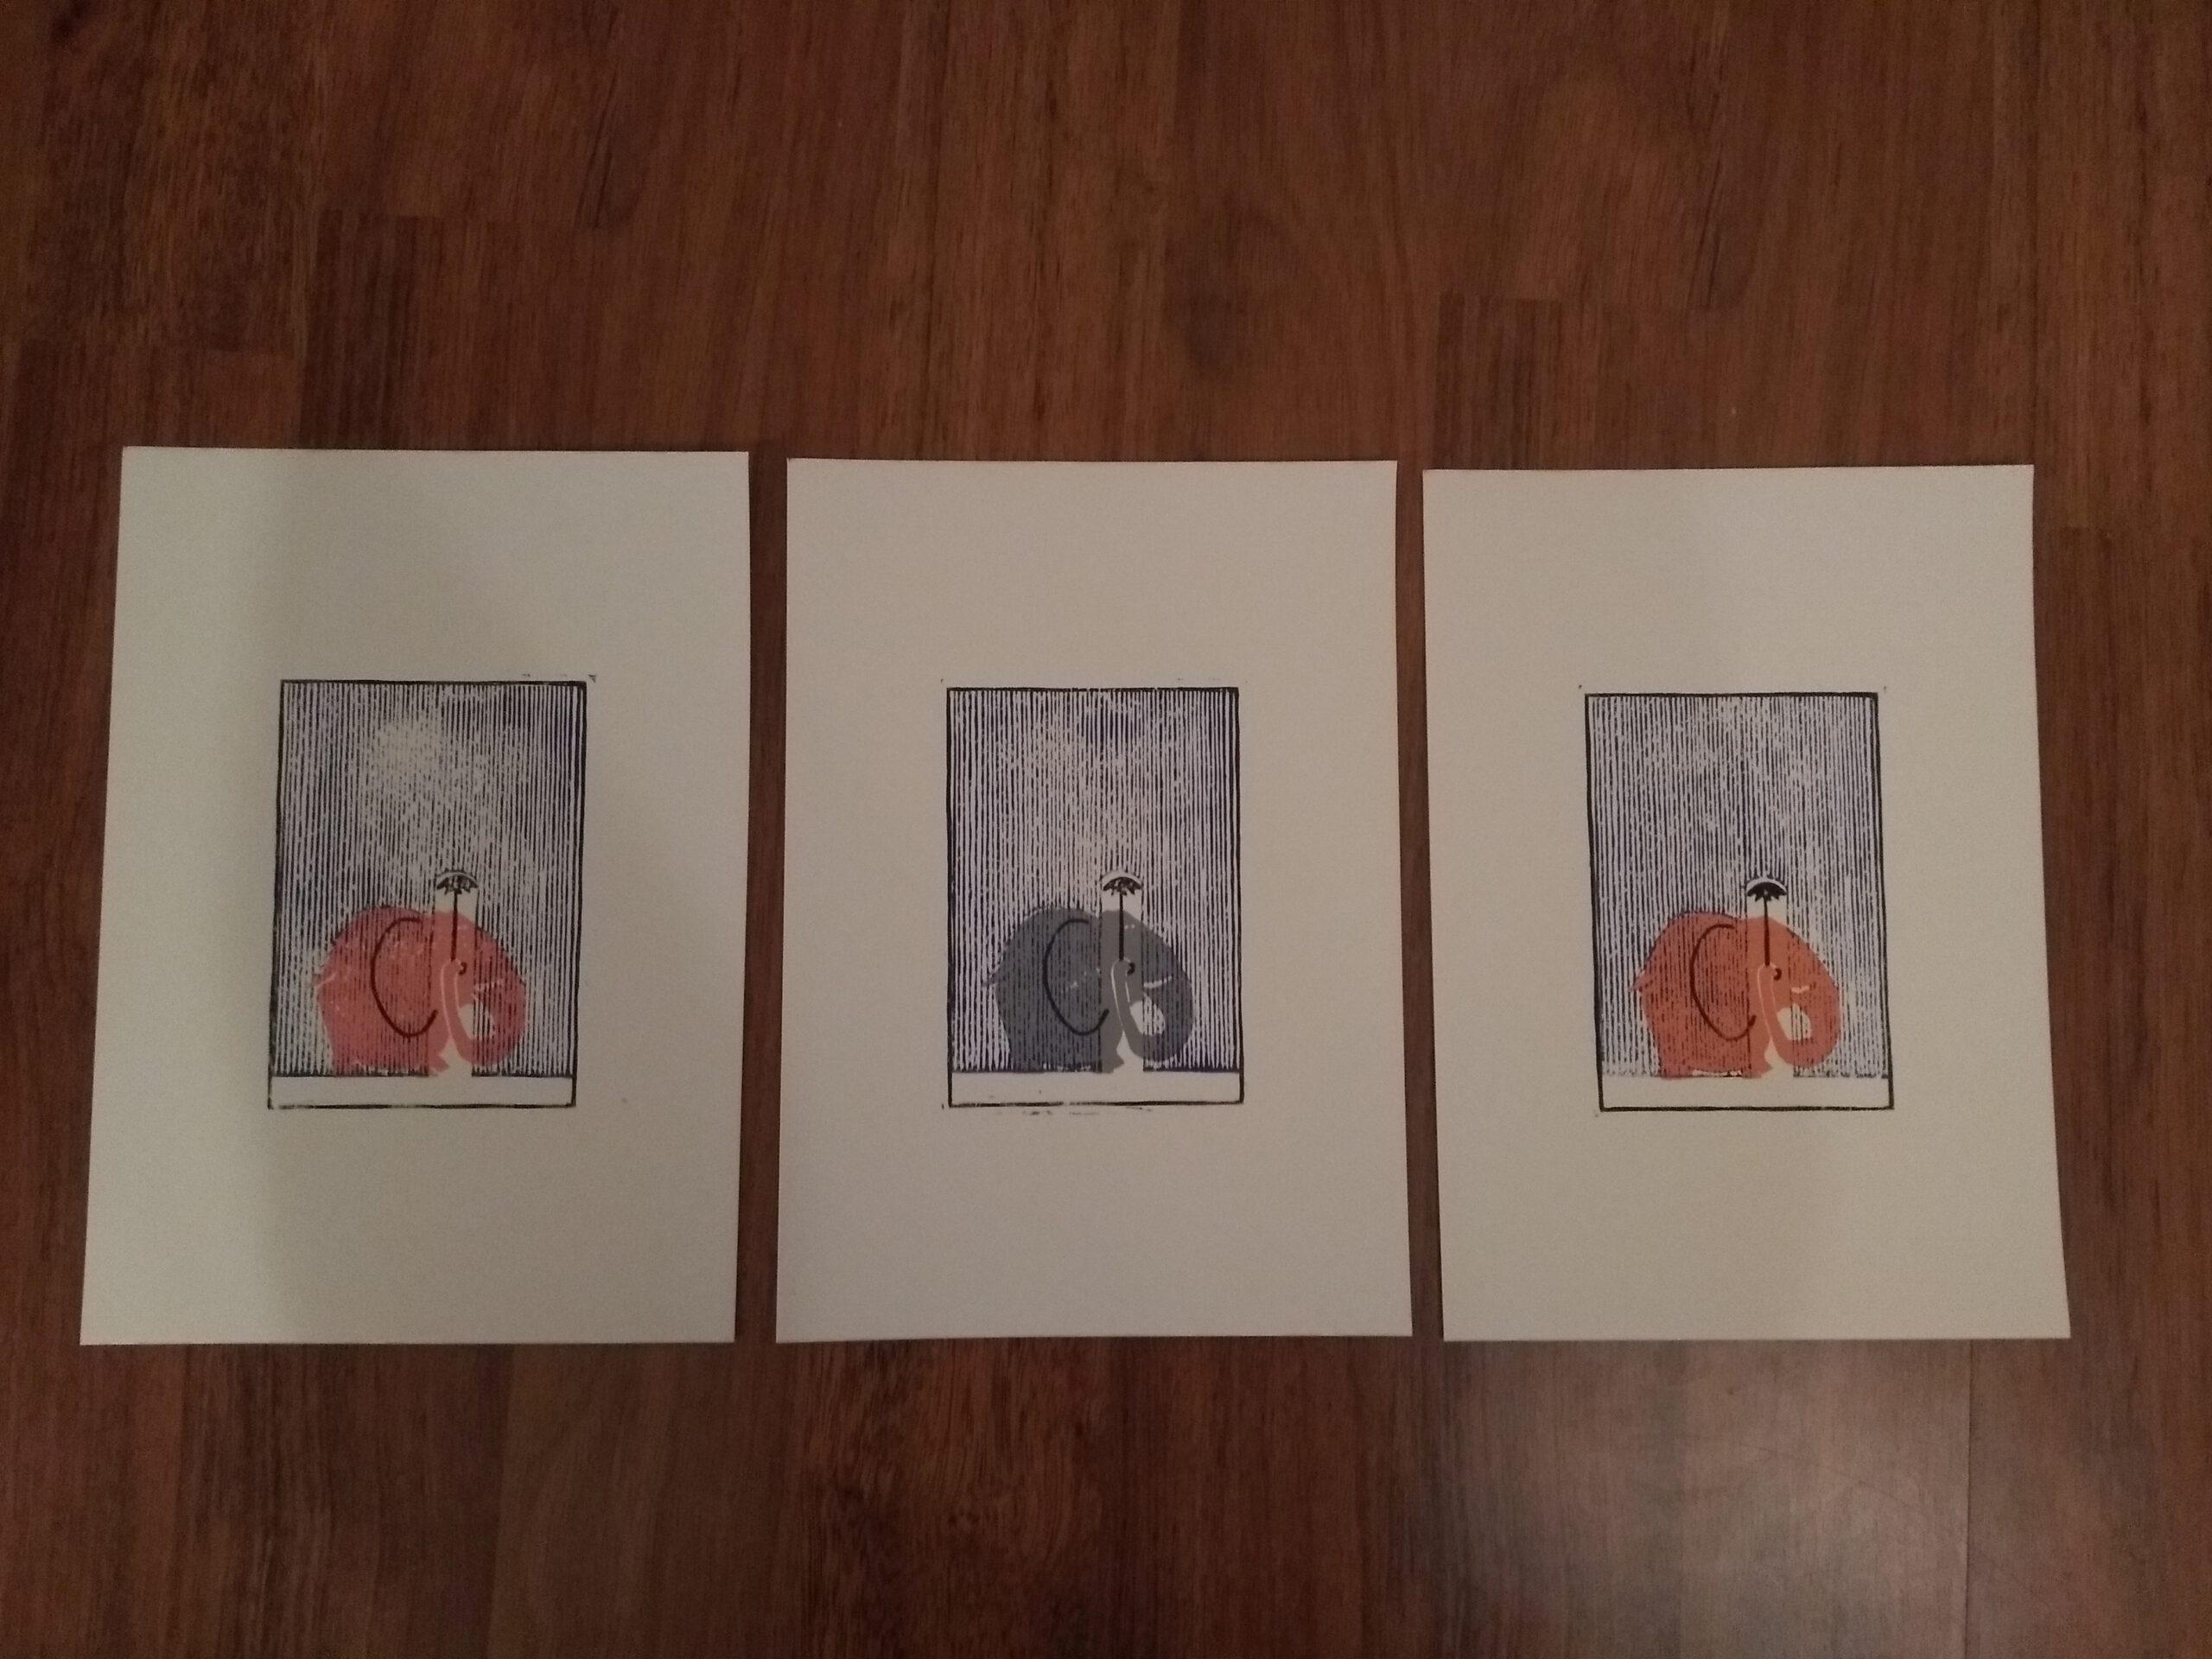 Drei Elefanten, Linoldruck